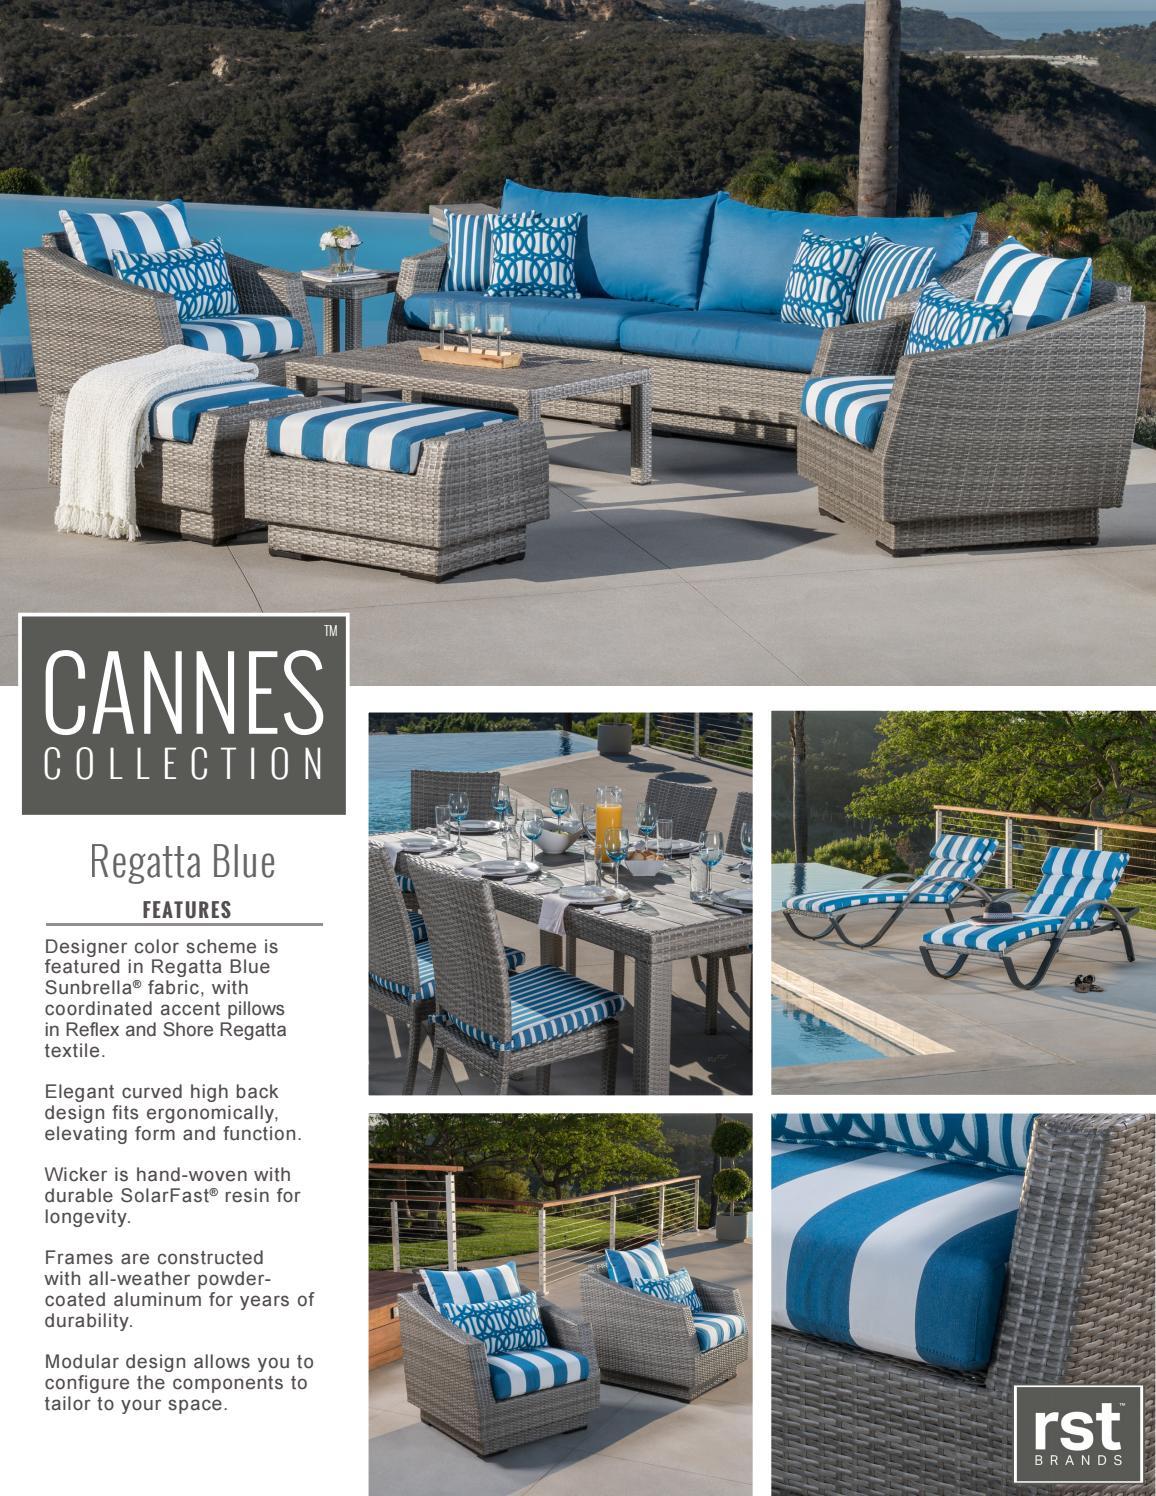 Cannes Regatta Sellsheet By Rst Brands Issuu